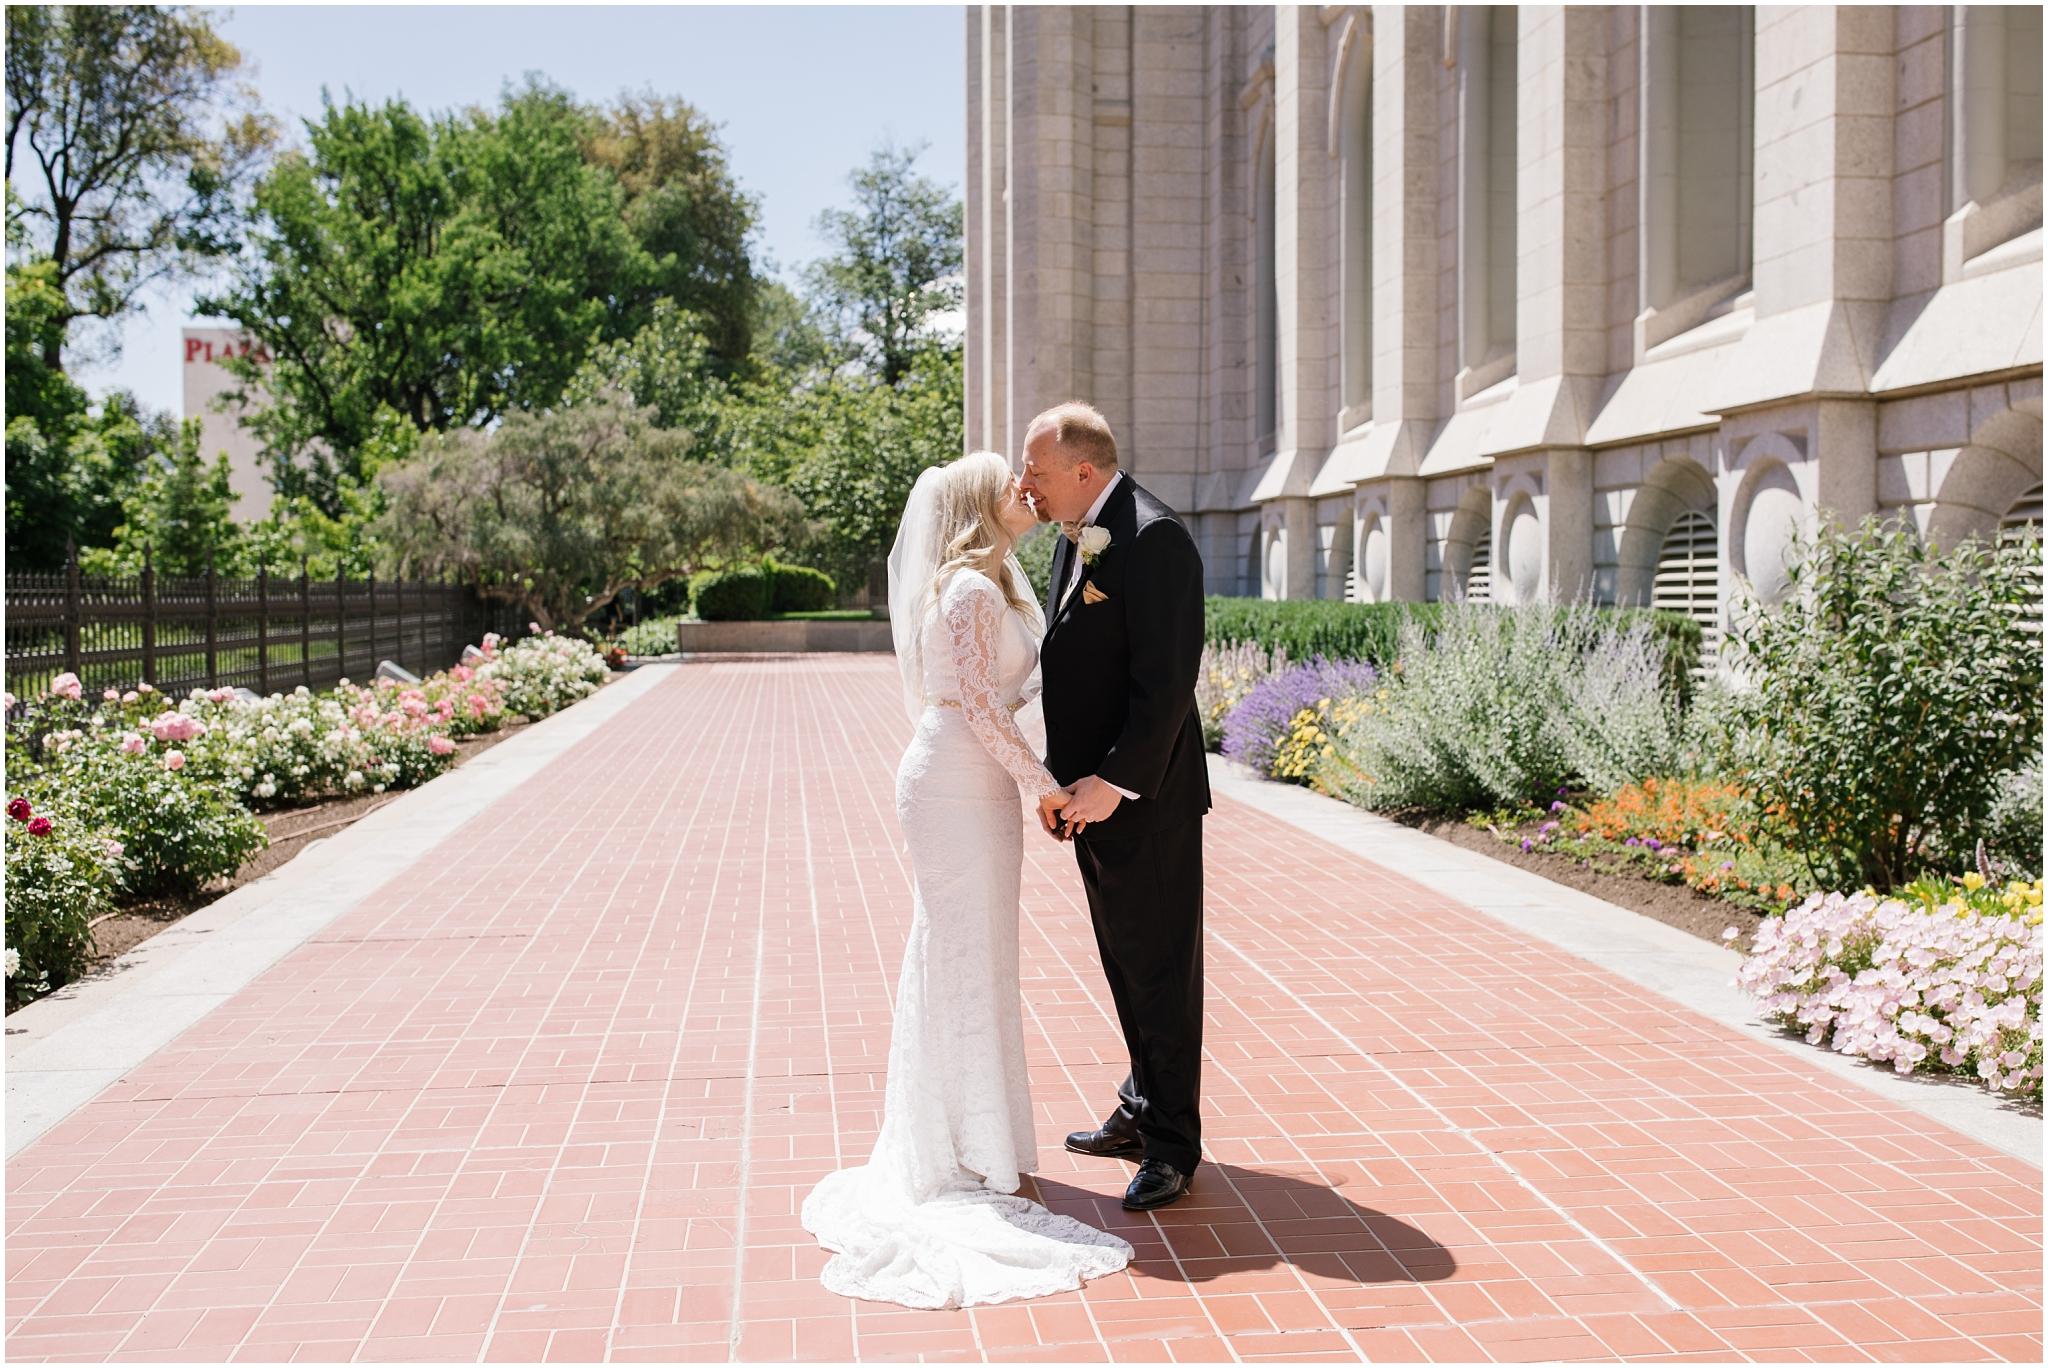 CherylandTyler-185_Lizzie-B-Imagery-Utah-Wedding-Photographer-Salt-Lake-City-Temple-Wells-Fargo-Building-Reception.jpg